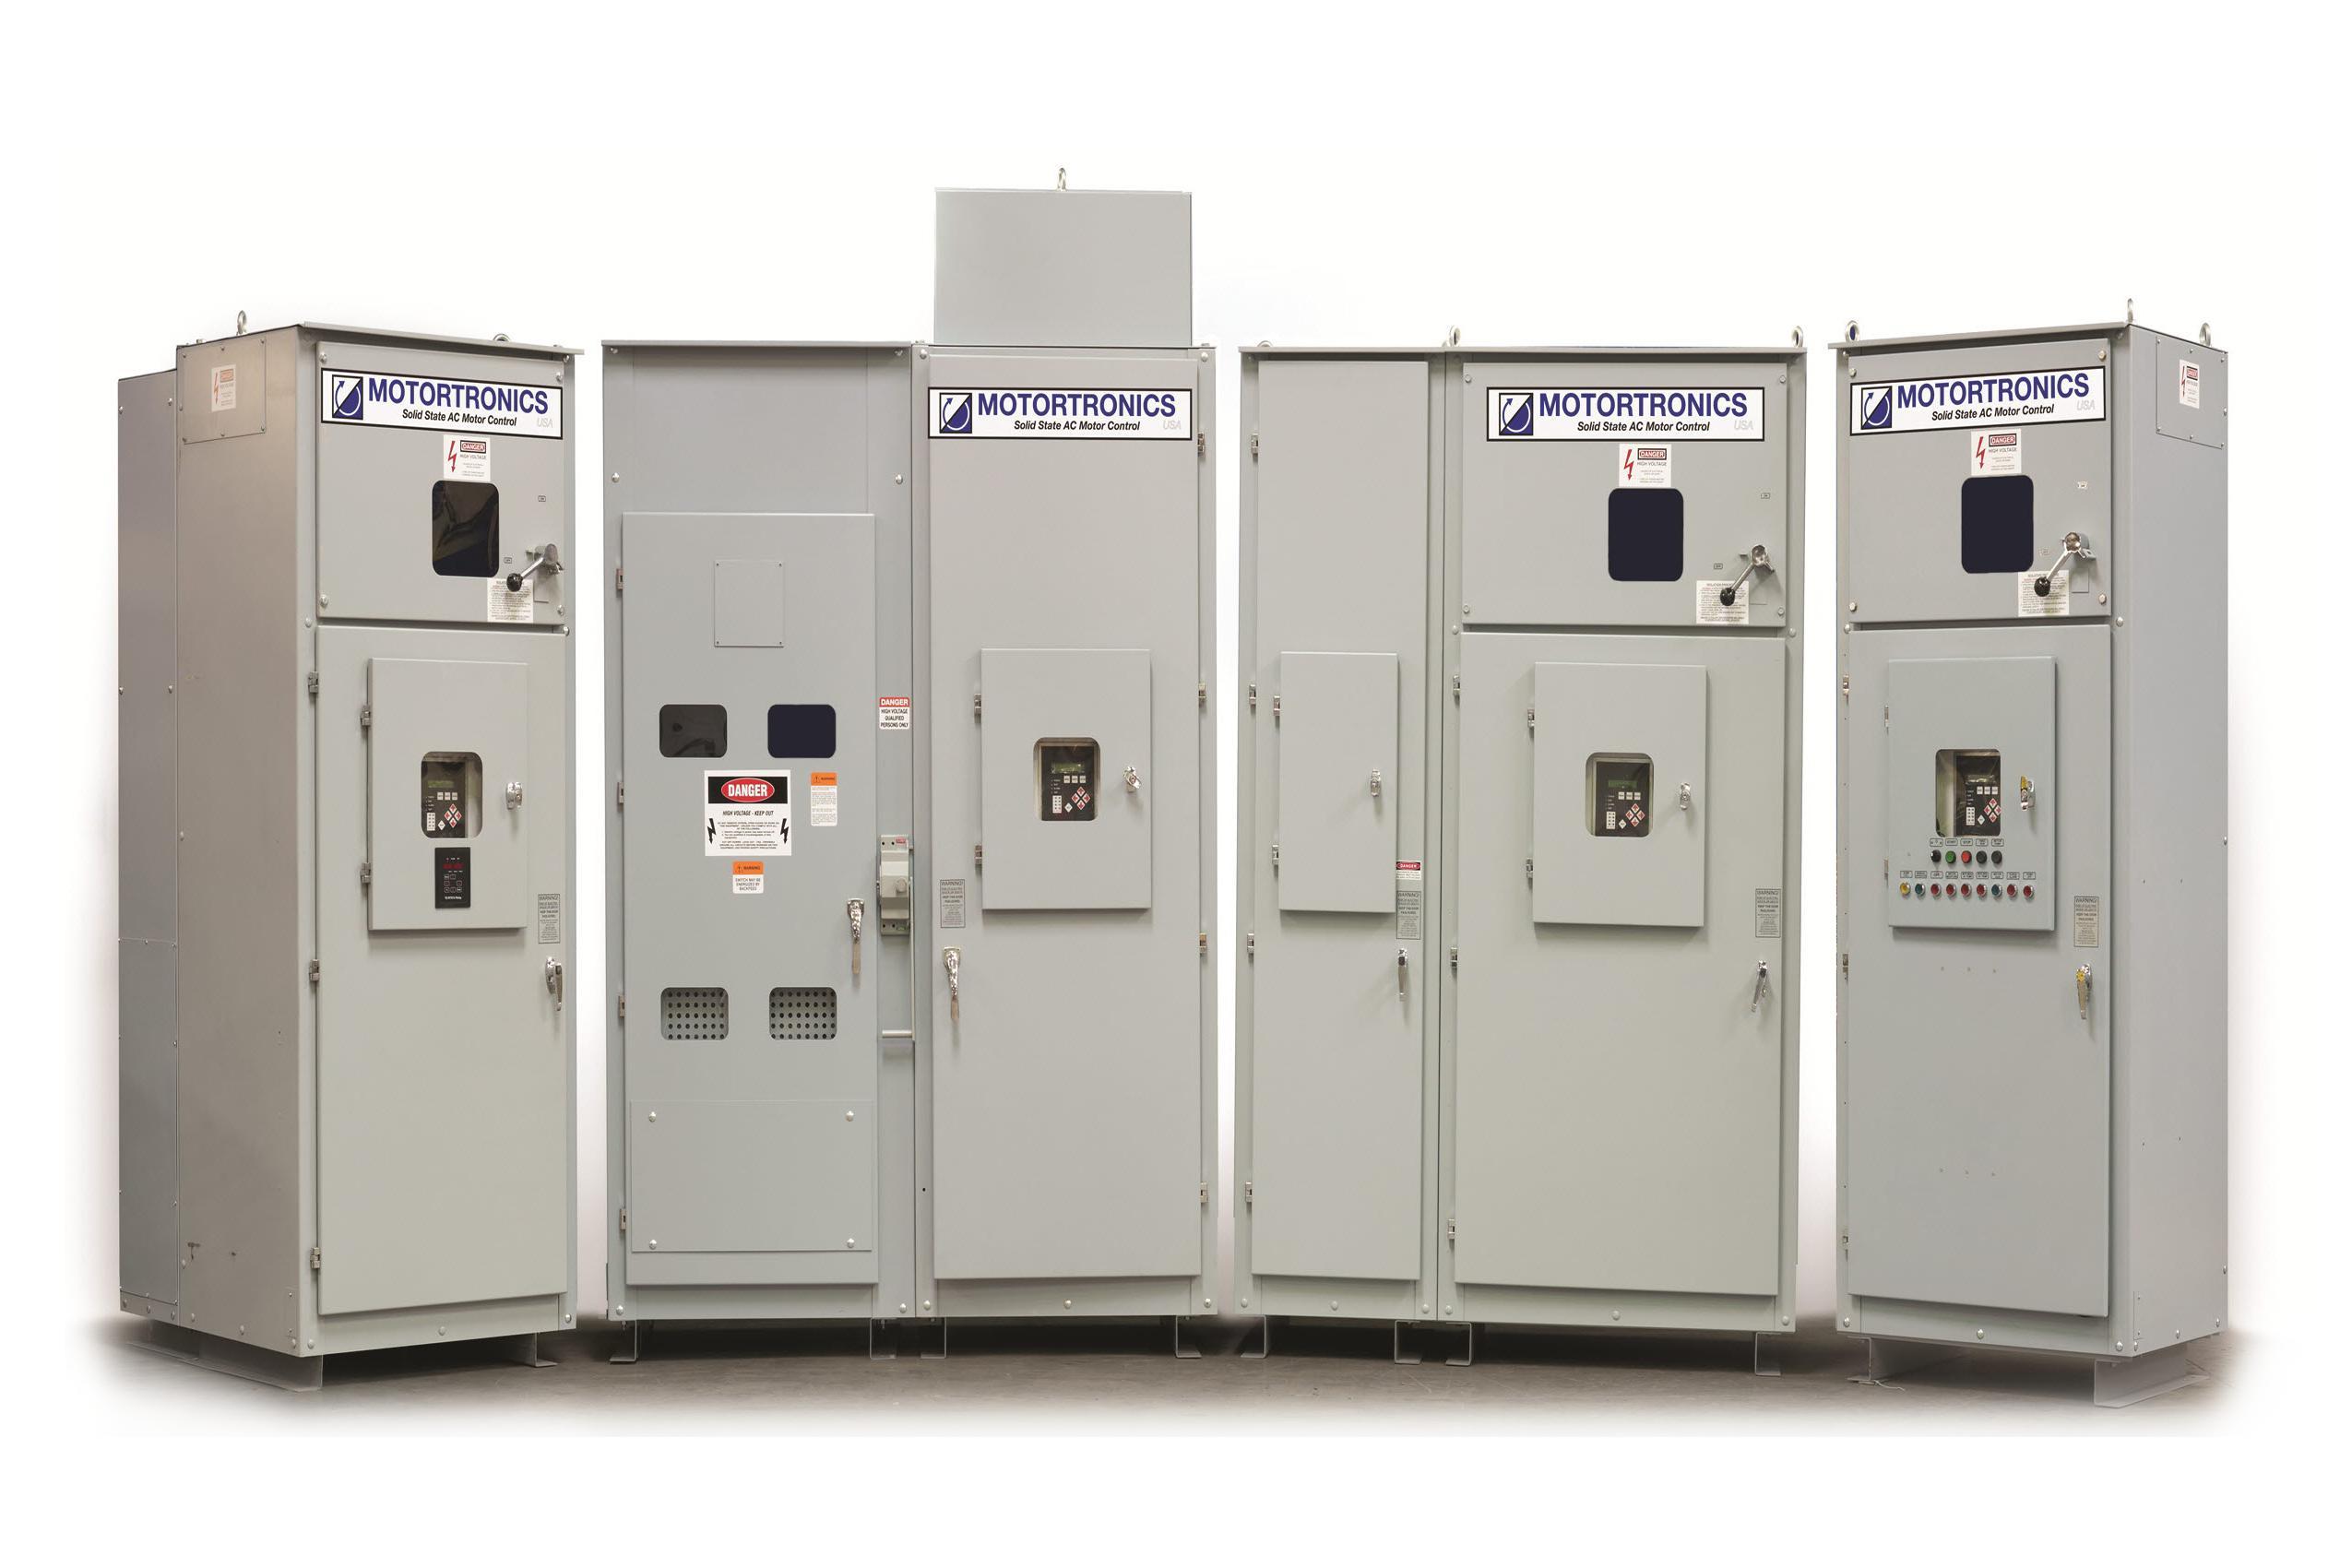 Motortronics International Korea's products